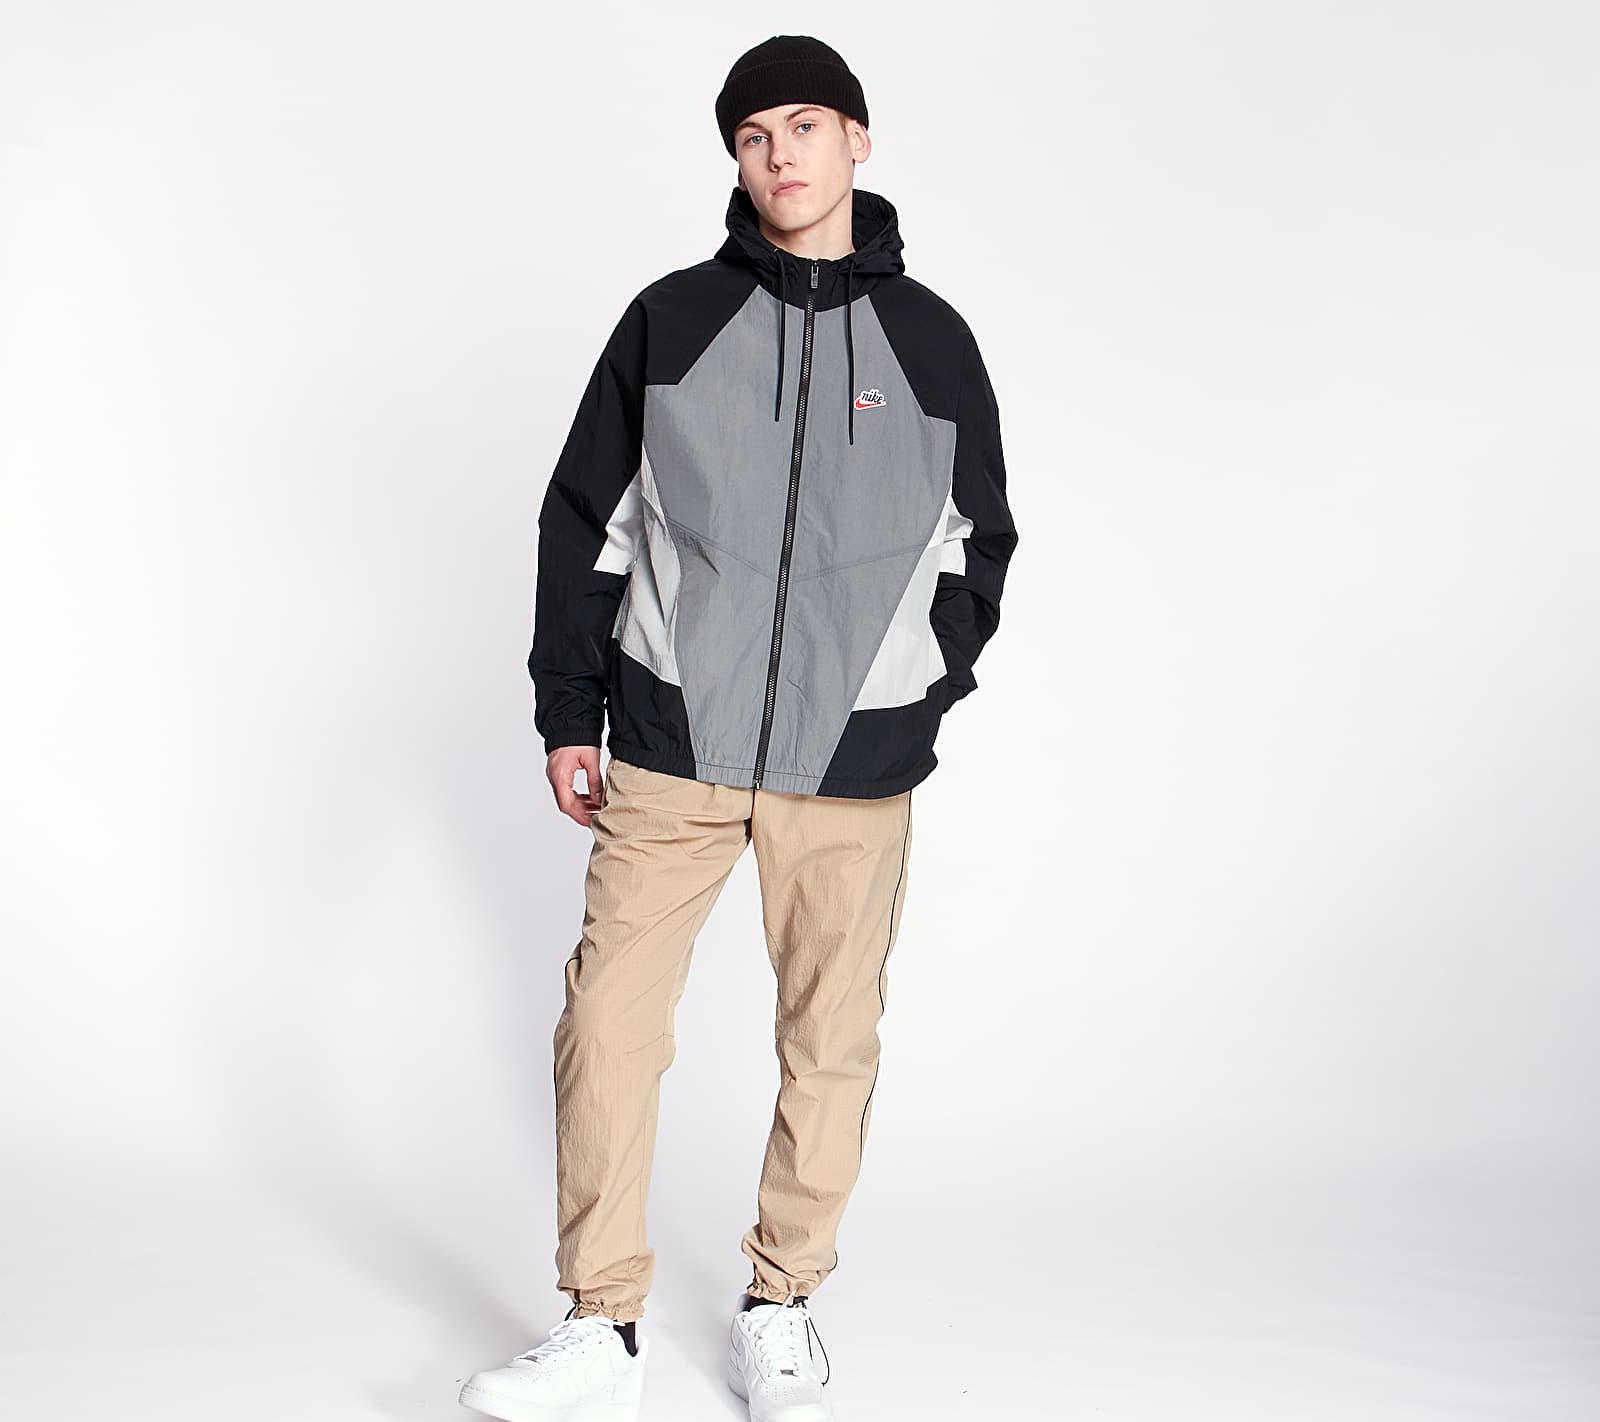 Nike Sportswear HE Wr Woven Signature Jacket Smoke Grey/ Black/ Light Smoke Grey, Gray